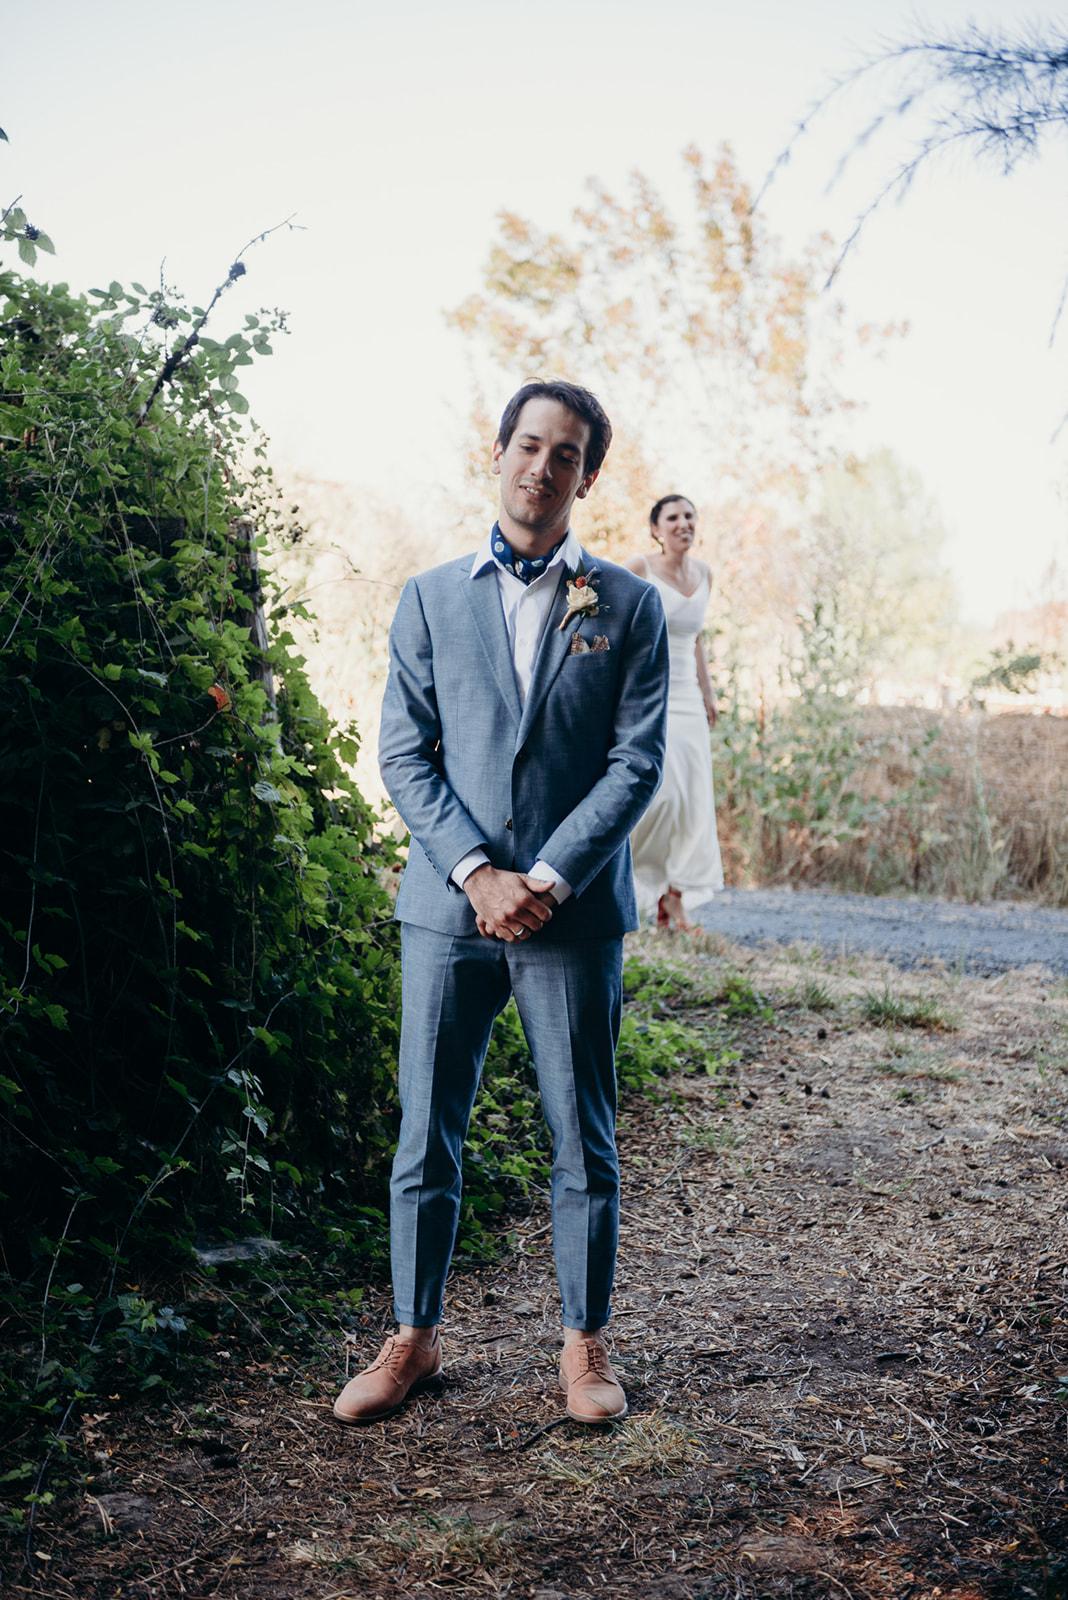 Wedding_photography_love_justin_nunnink_photographer_Oregon_New_orleans_portland_travel_nature.jpg